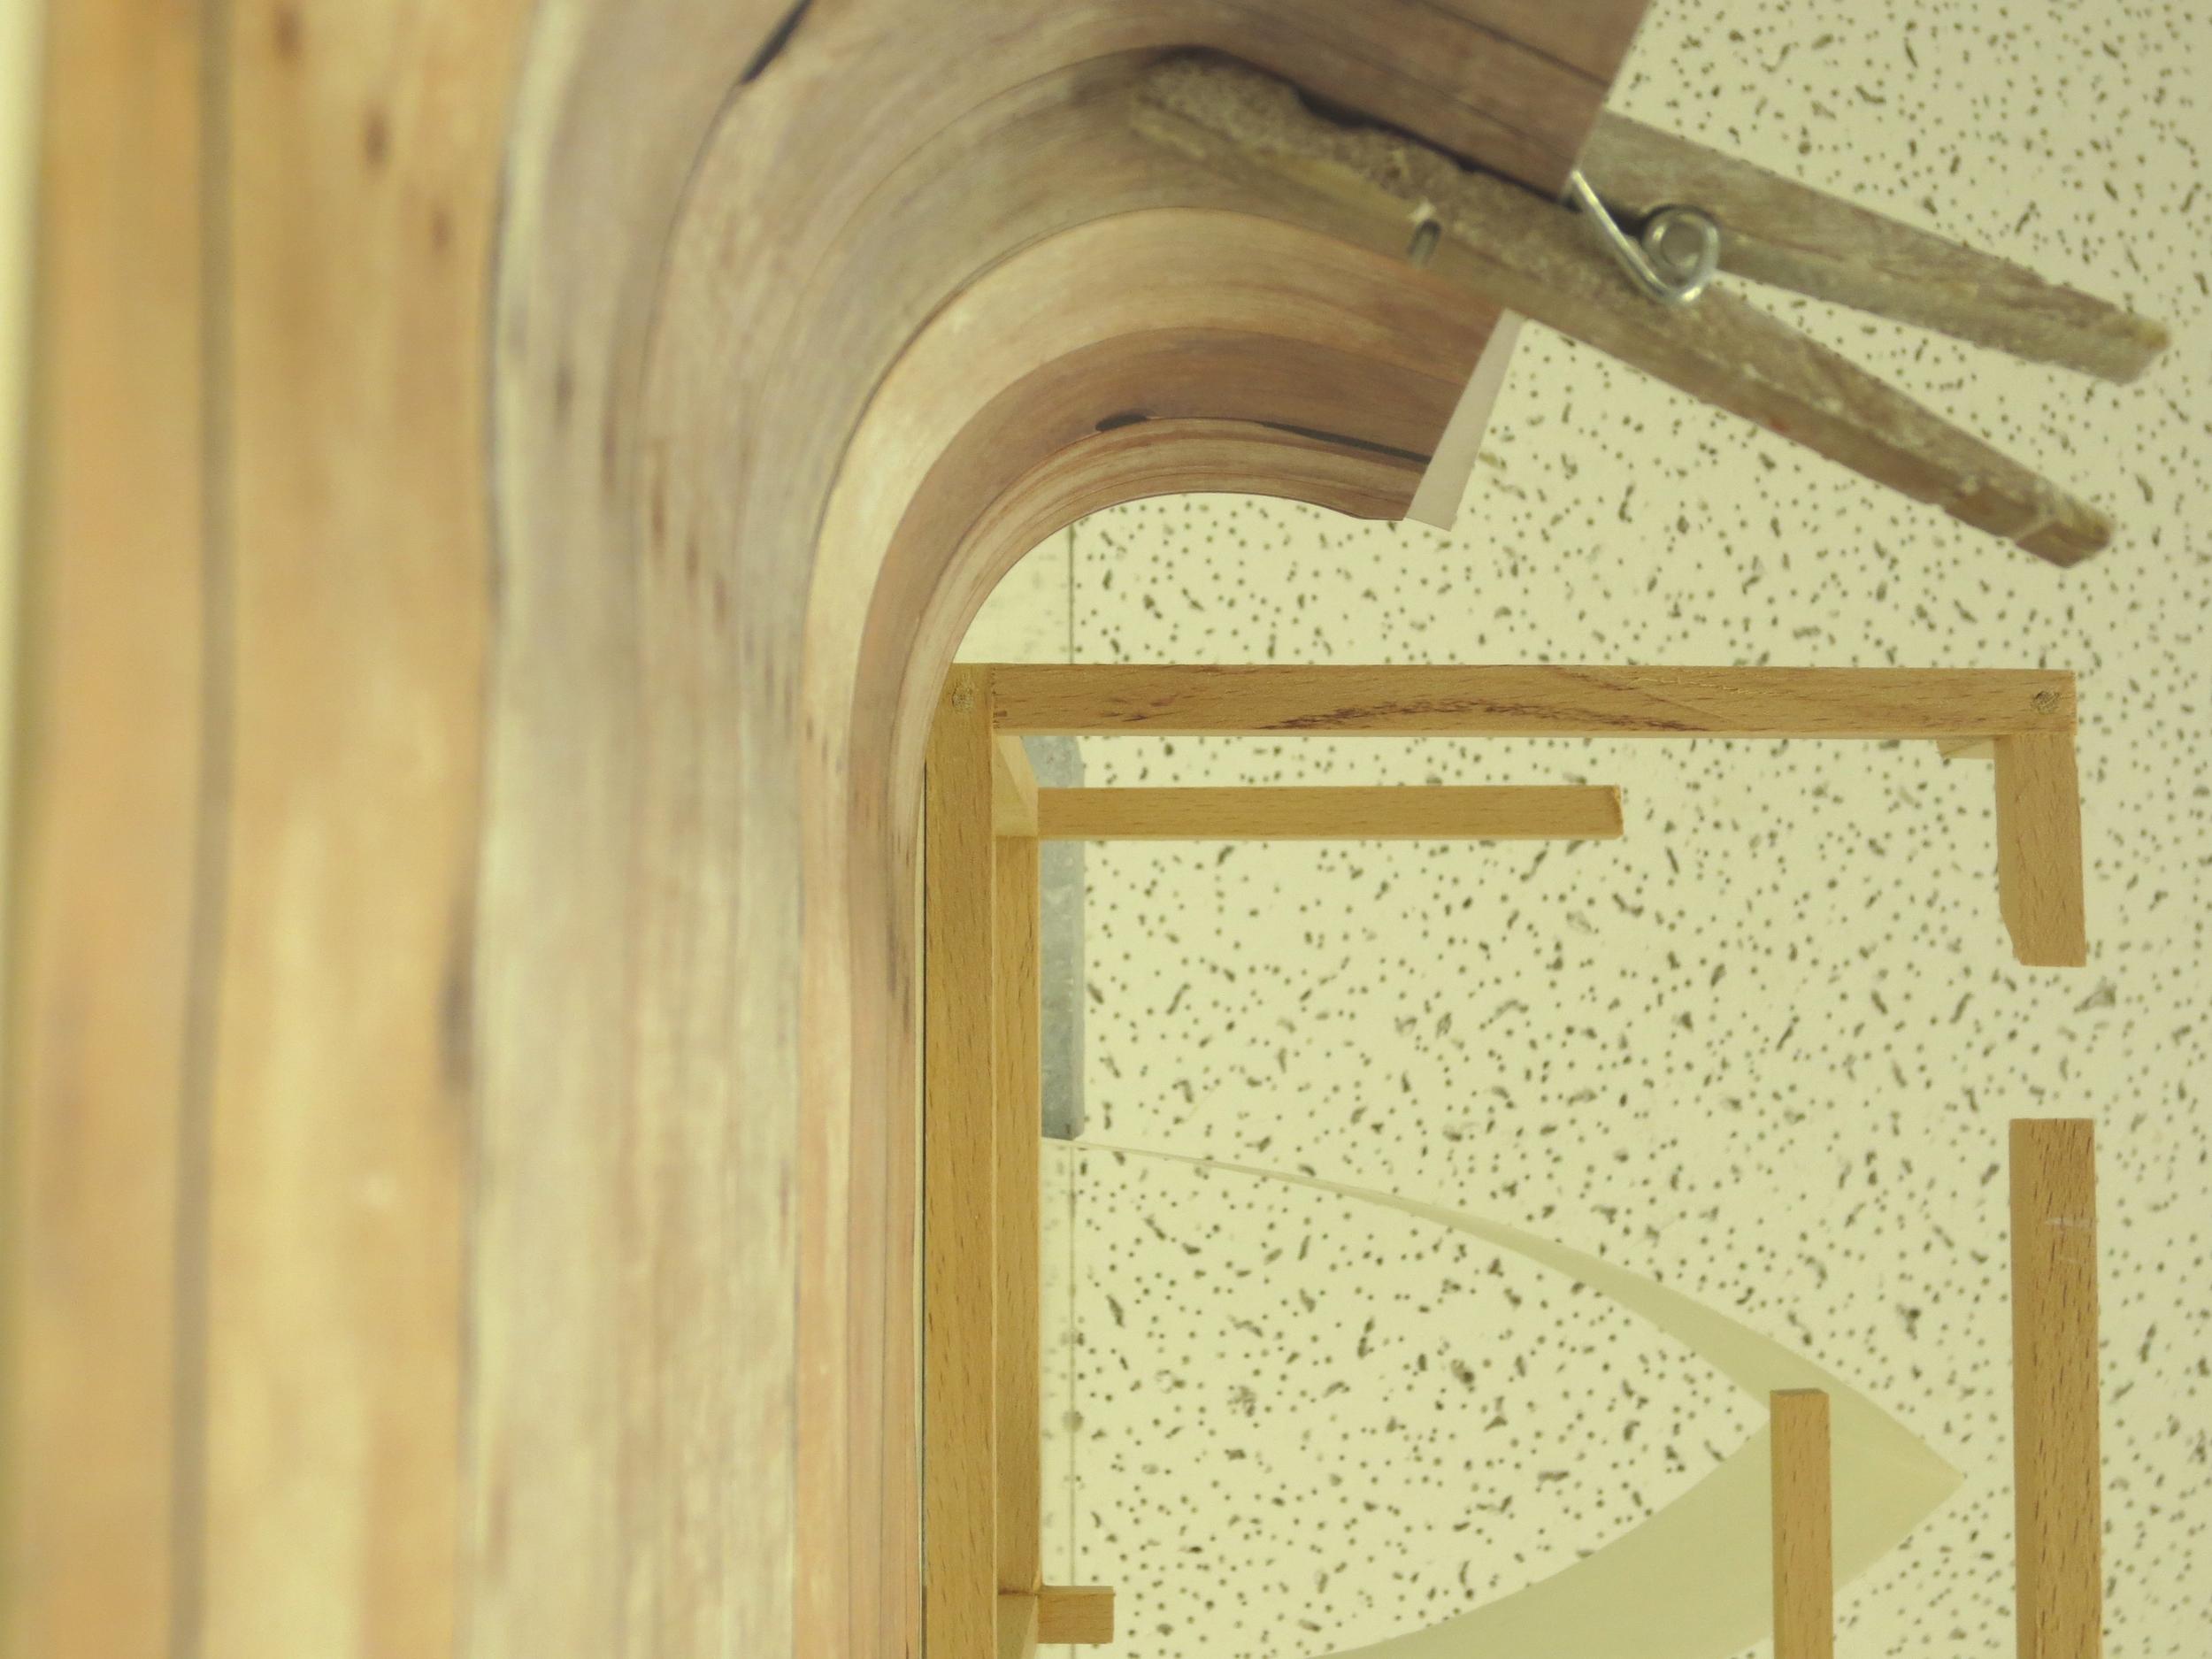 Ceiling tile, Birch, fiber glass, tile, paper, paperclip. 2013